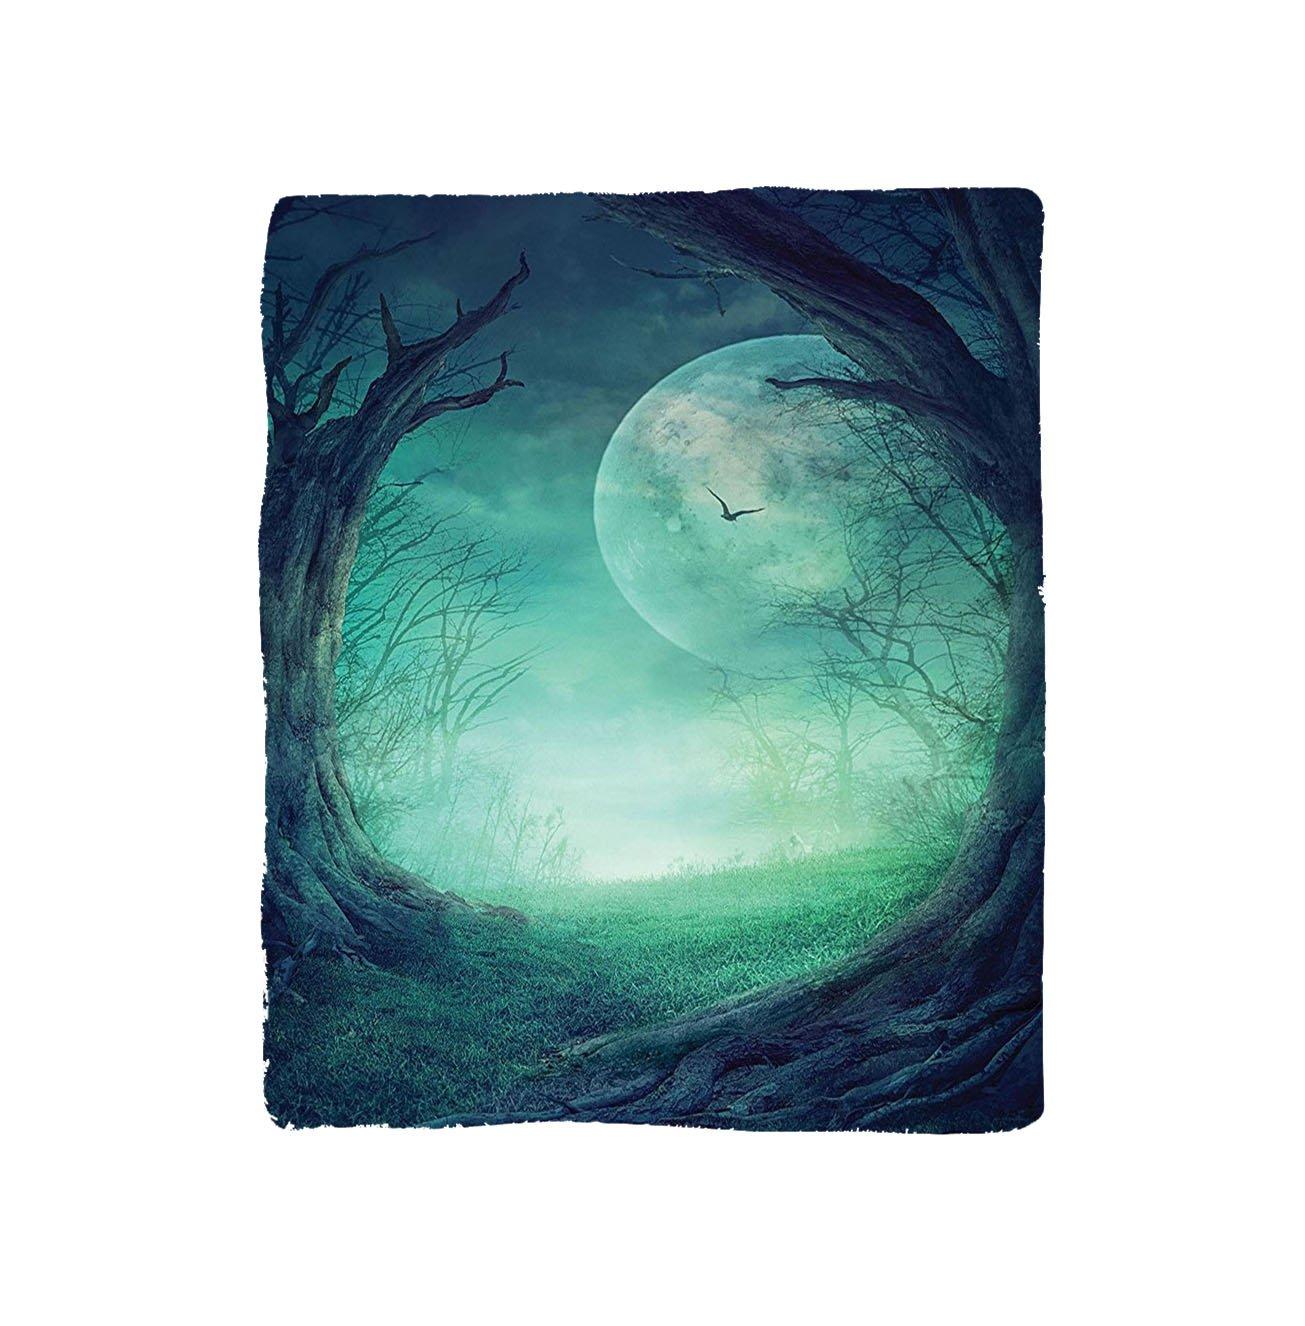 VROSELV Custom Blanket Moon Forest Gothic Misty Horror Illustration of Autumn Valley with Woods Spooky Tree and Full Moon Scene Soft Fleece Throw Blanket Navy Green